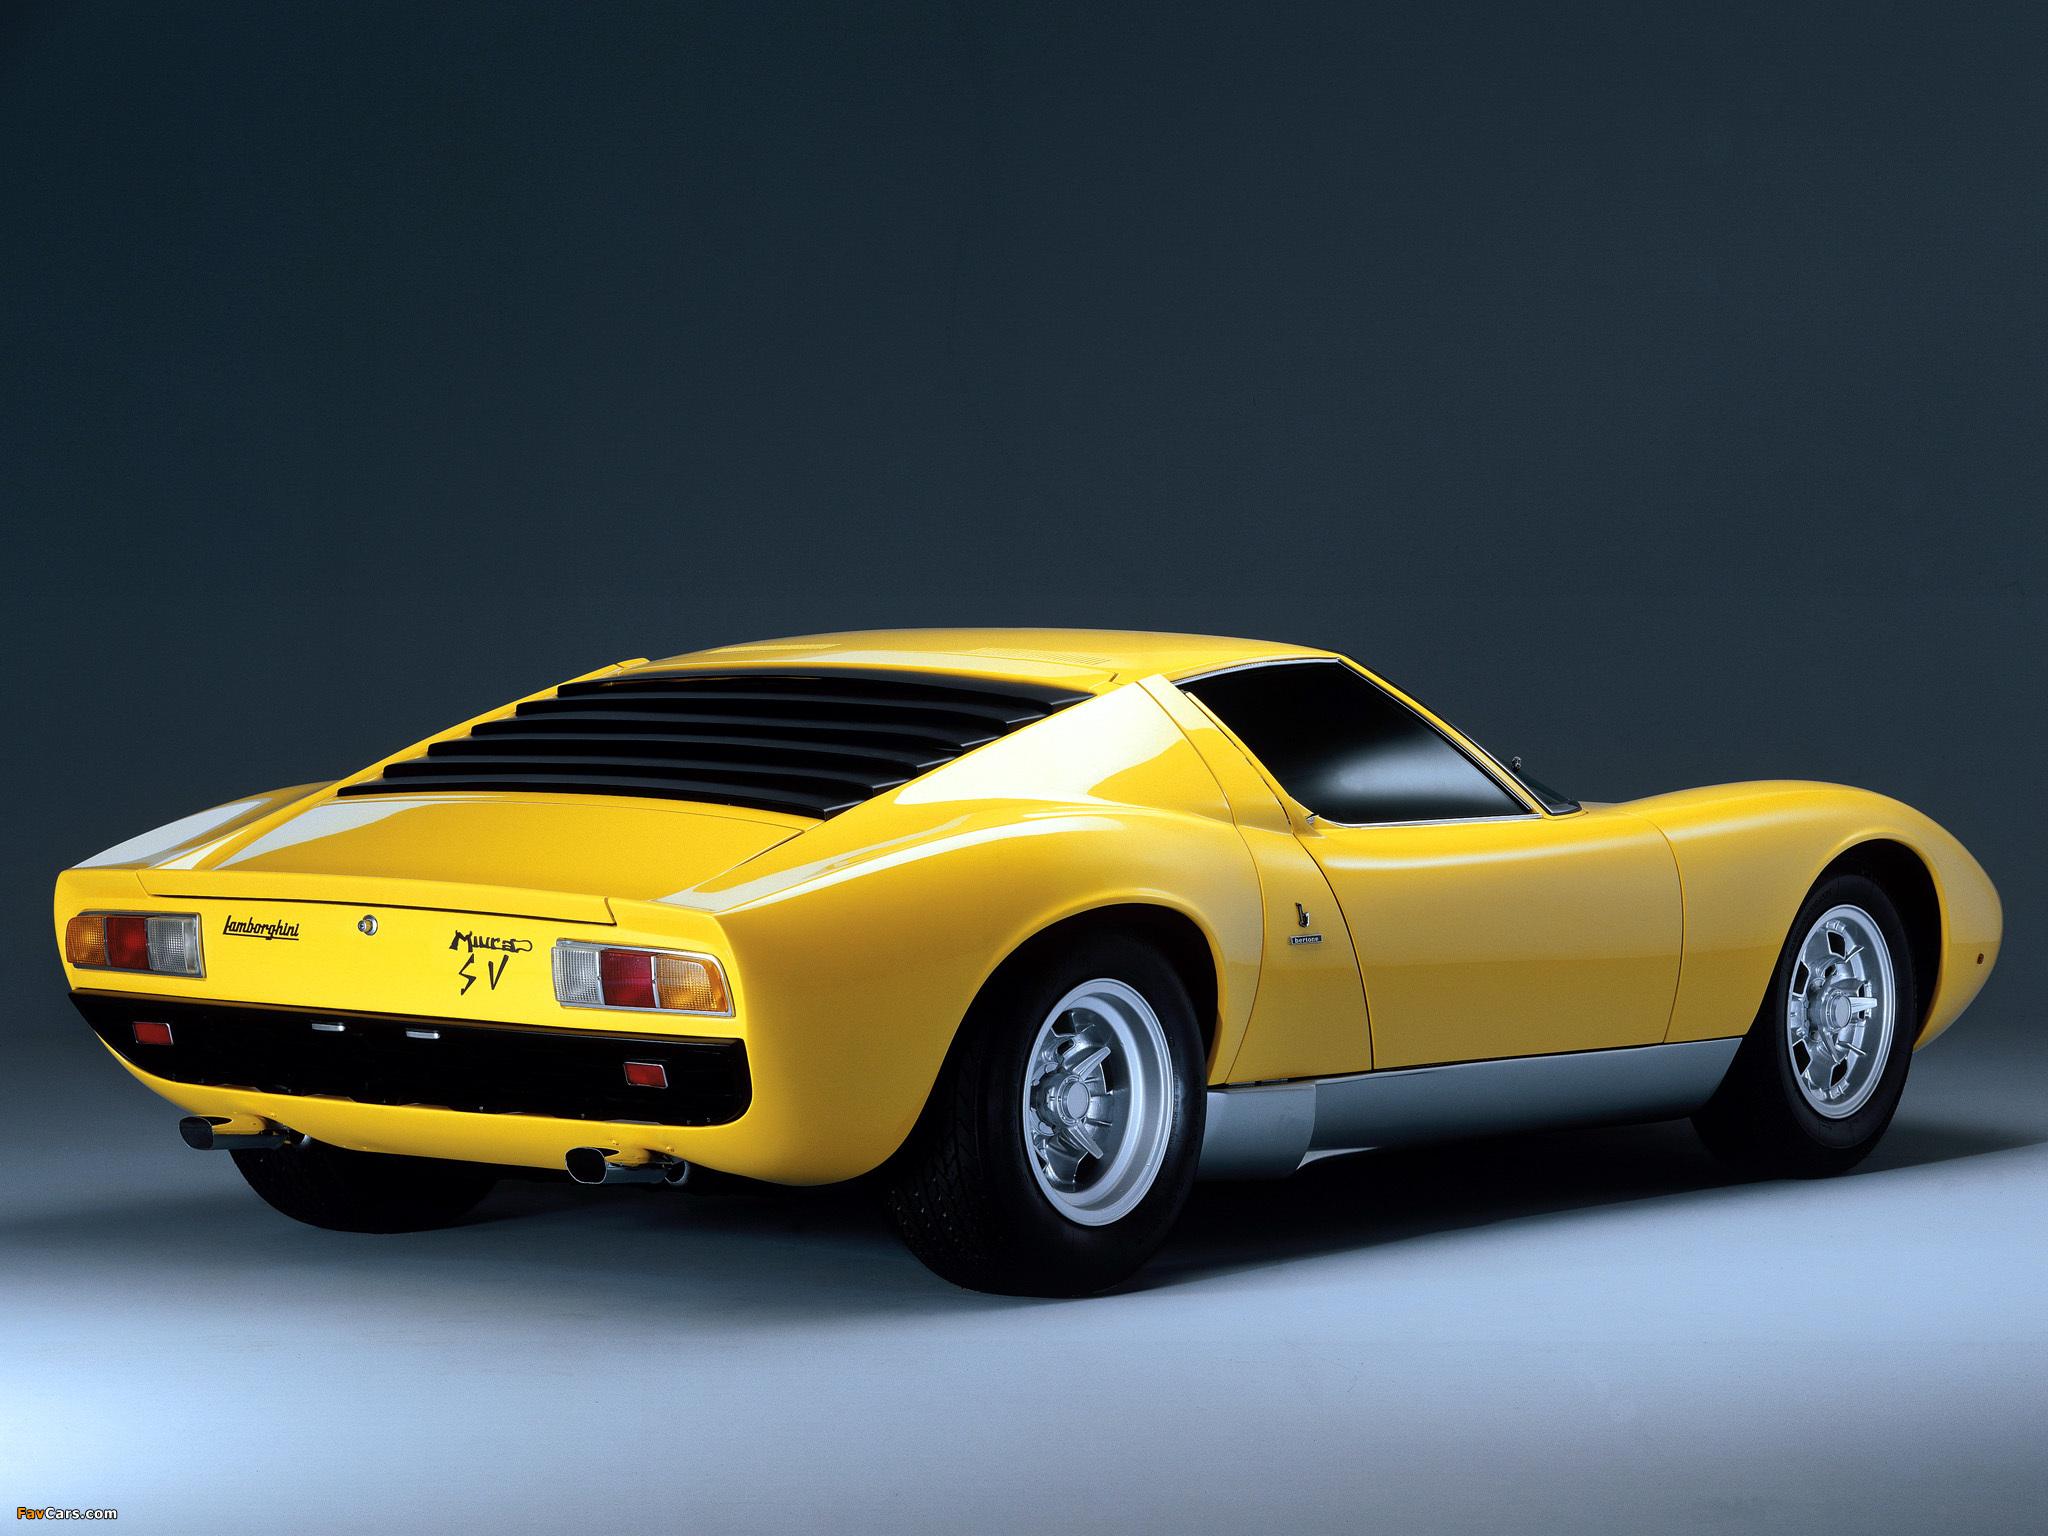 Lamborghini Miura P400 Sv 1971 72 Wallpapers 2048x1536